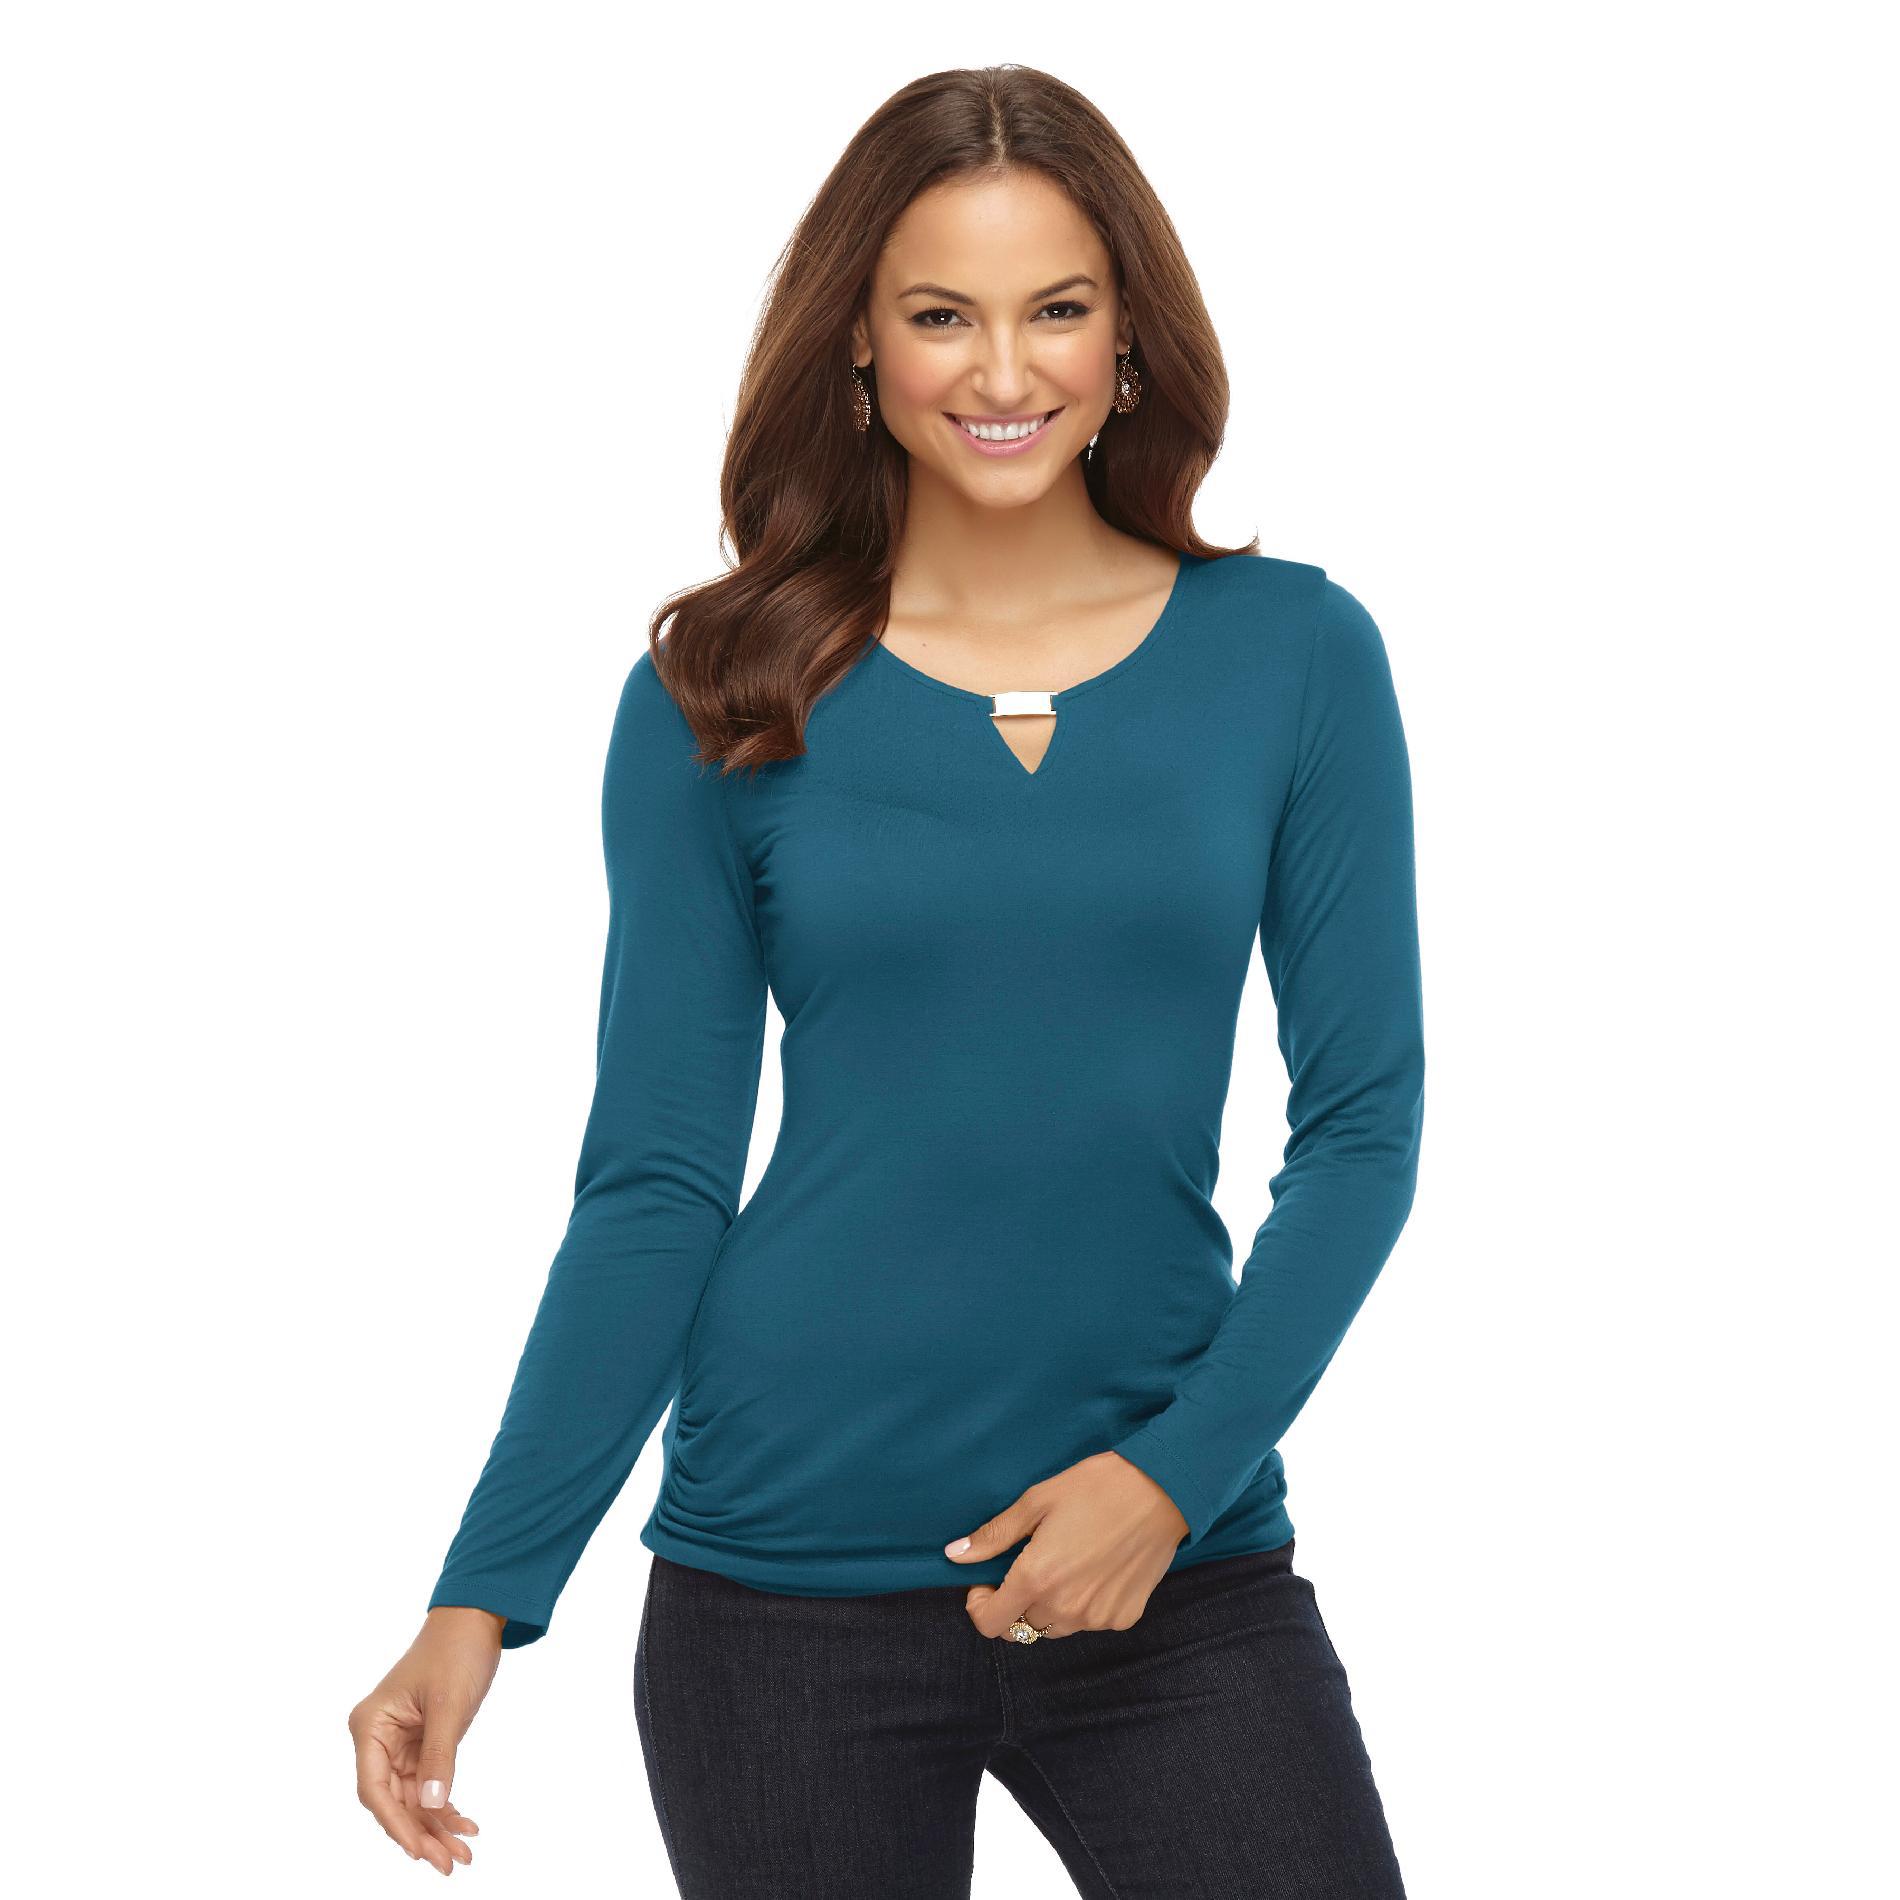 Covington Women's Embellished Shirt at Sears.com